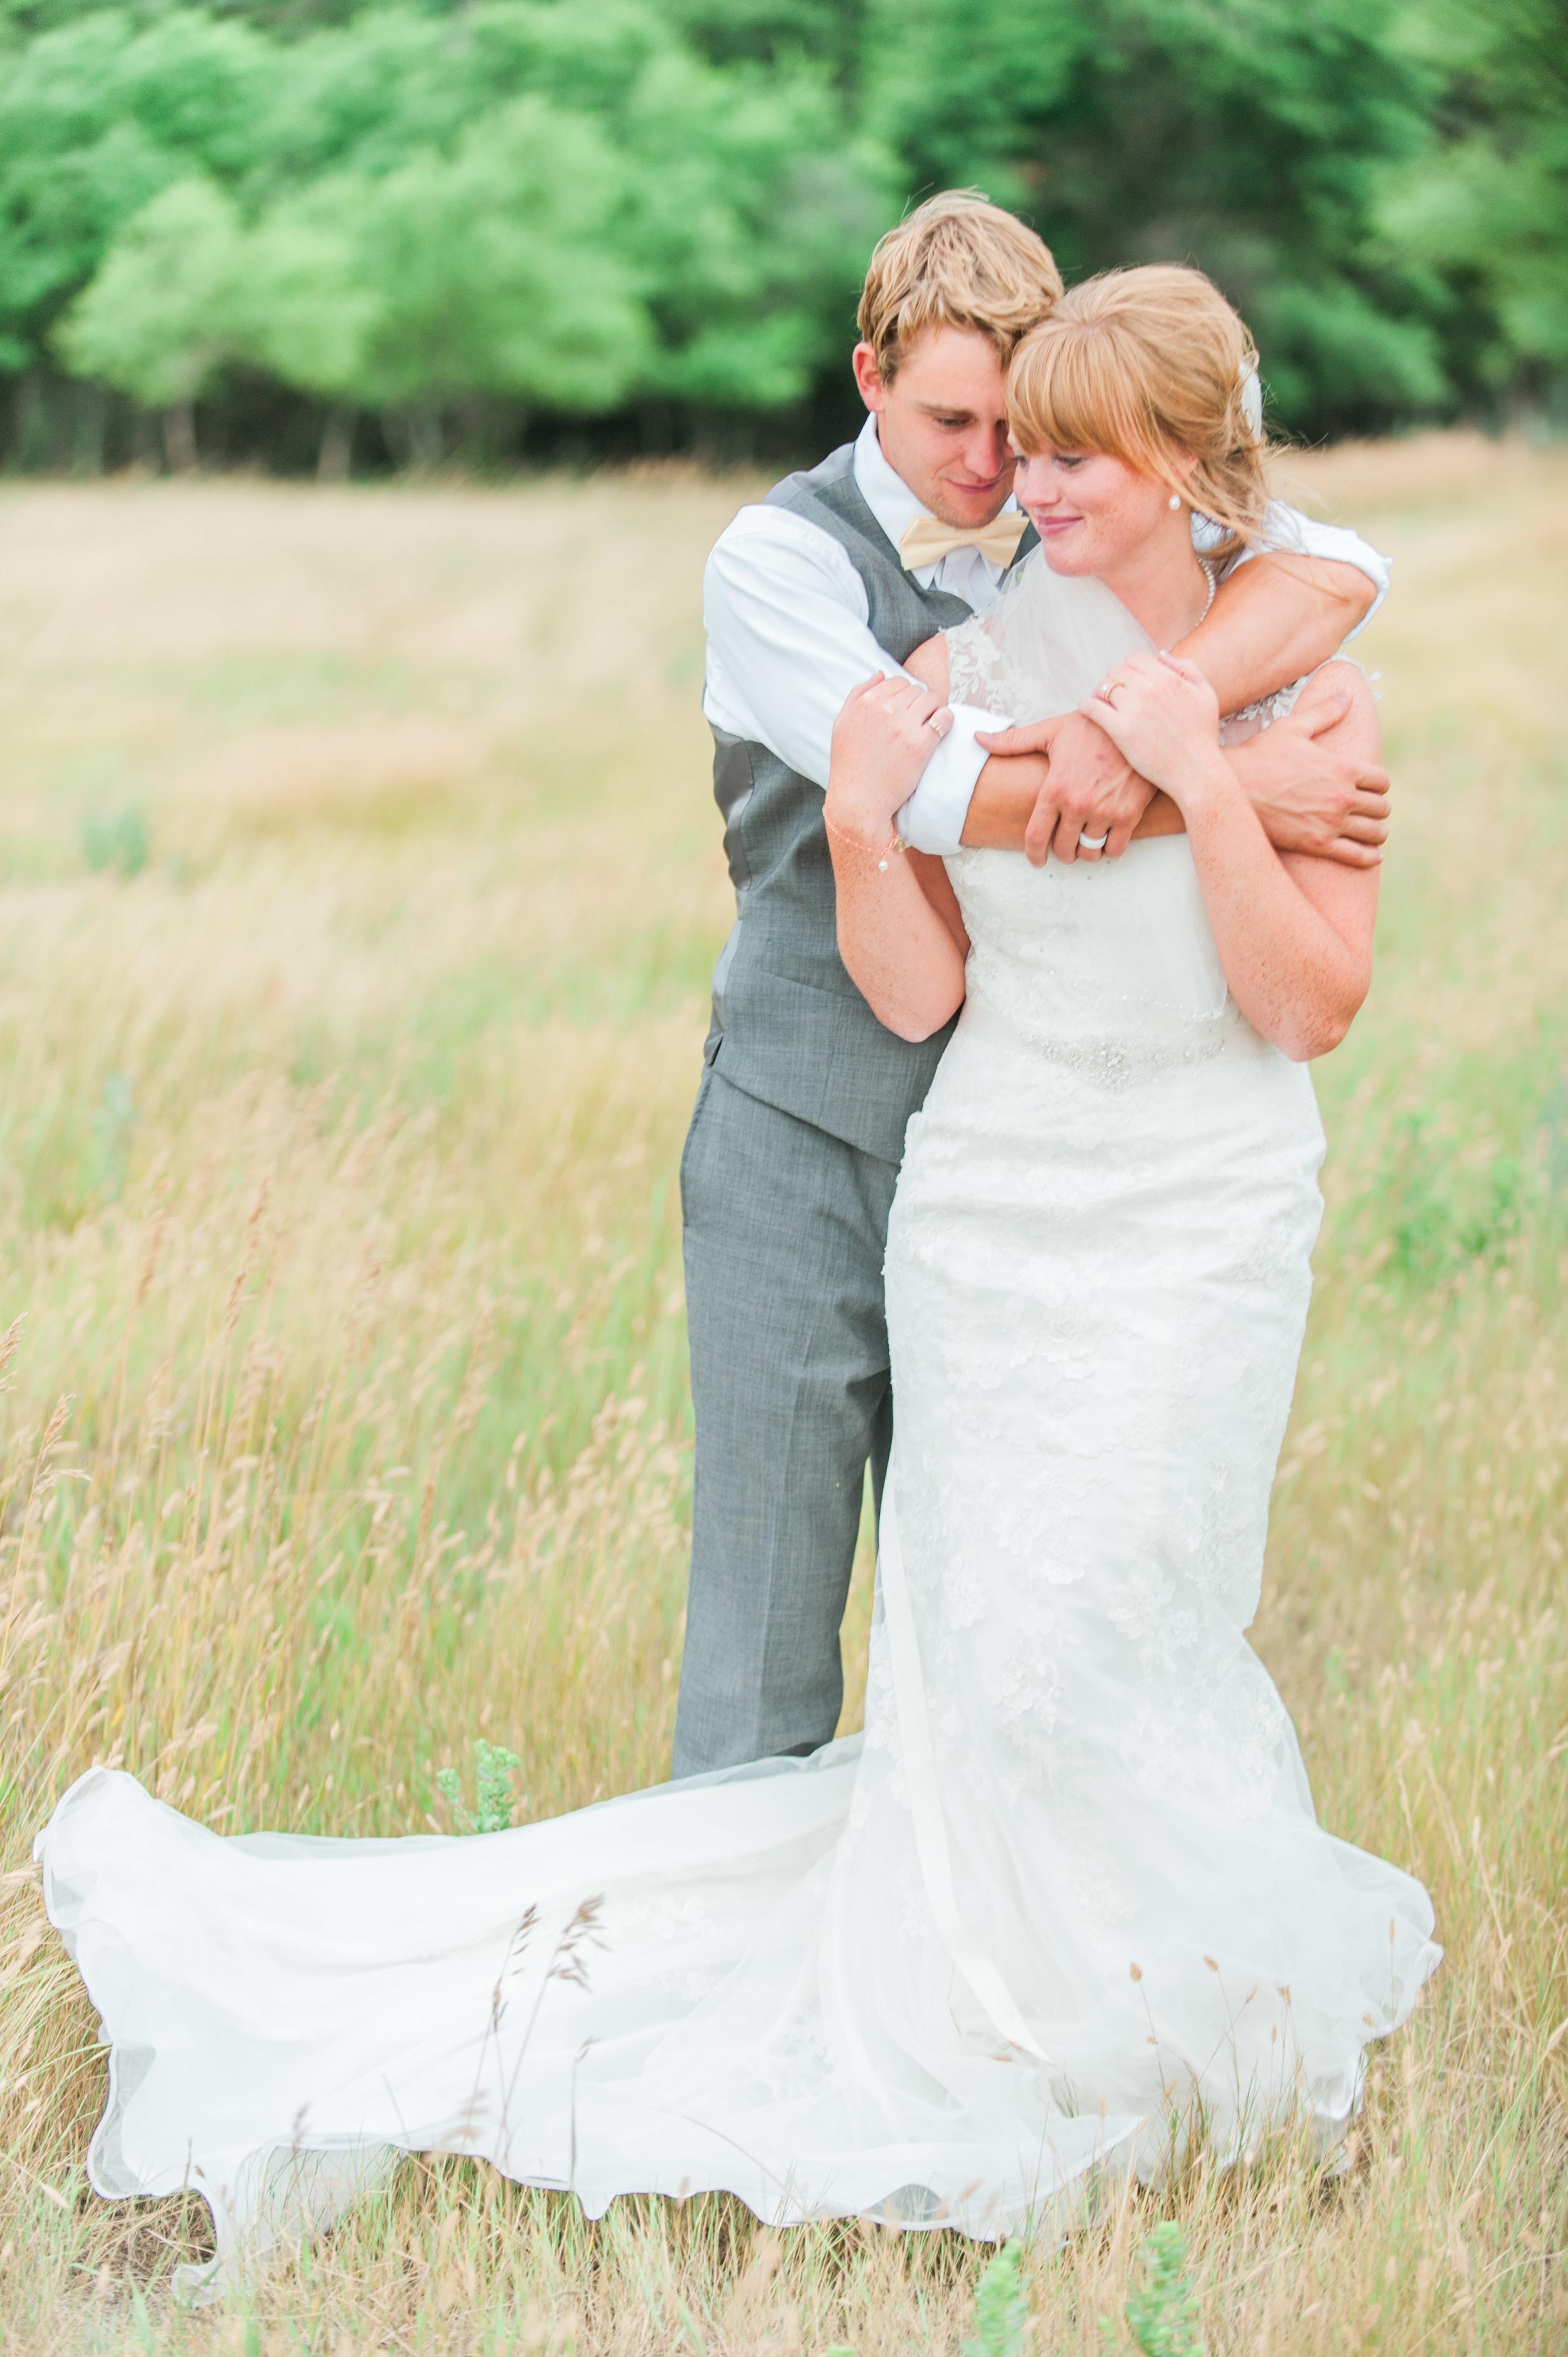 wedding-photography-31.jpg